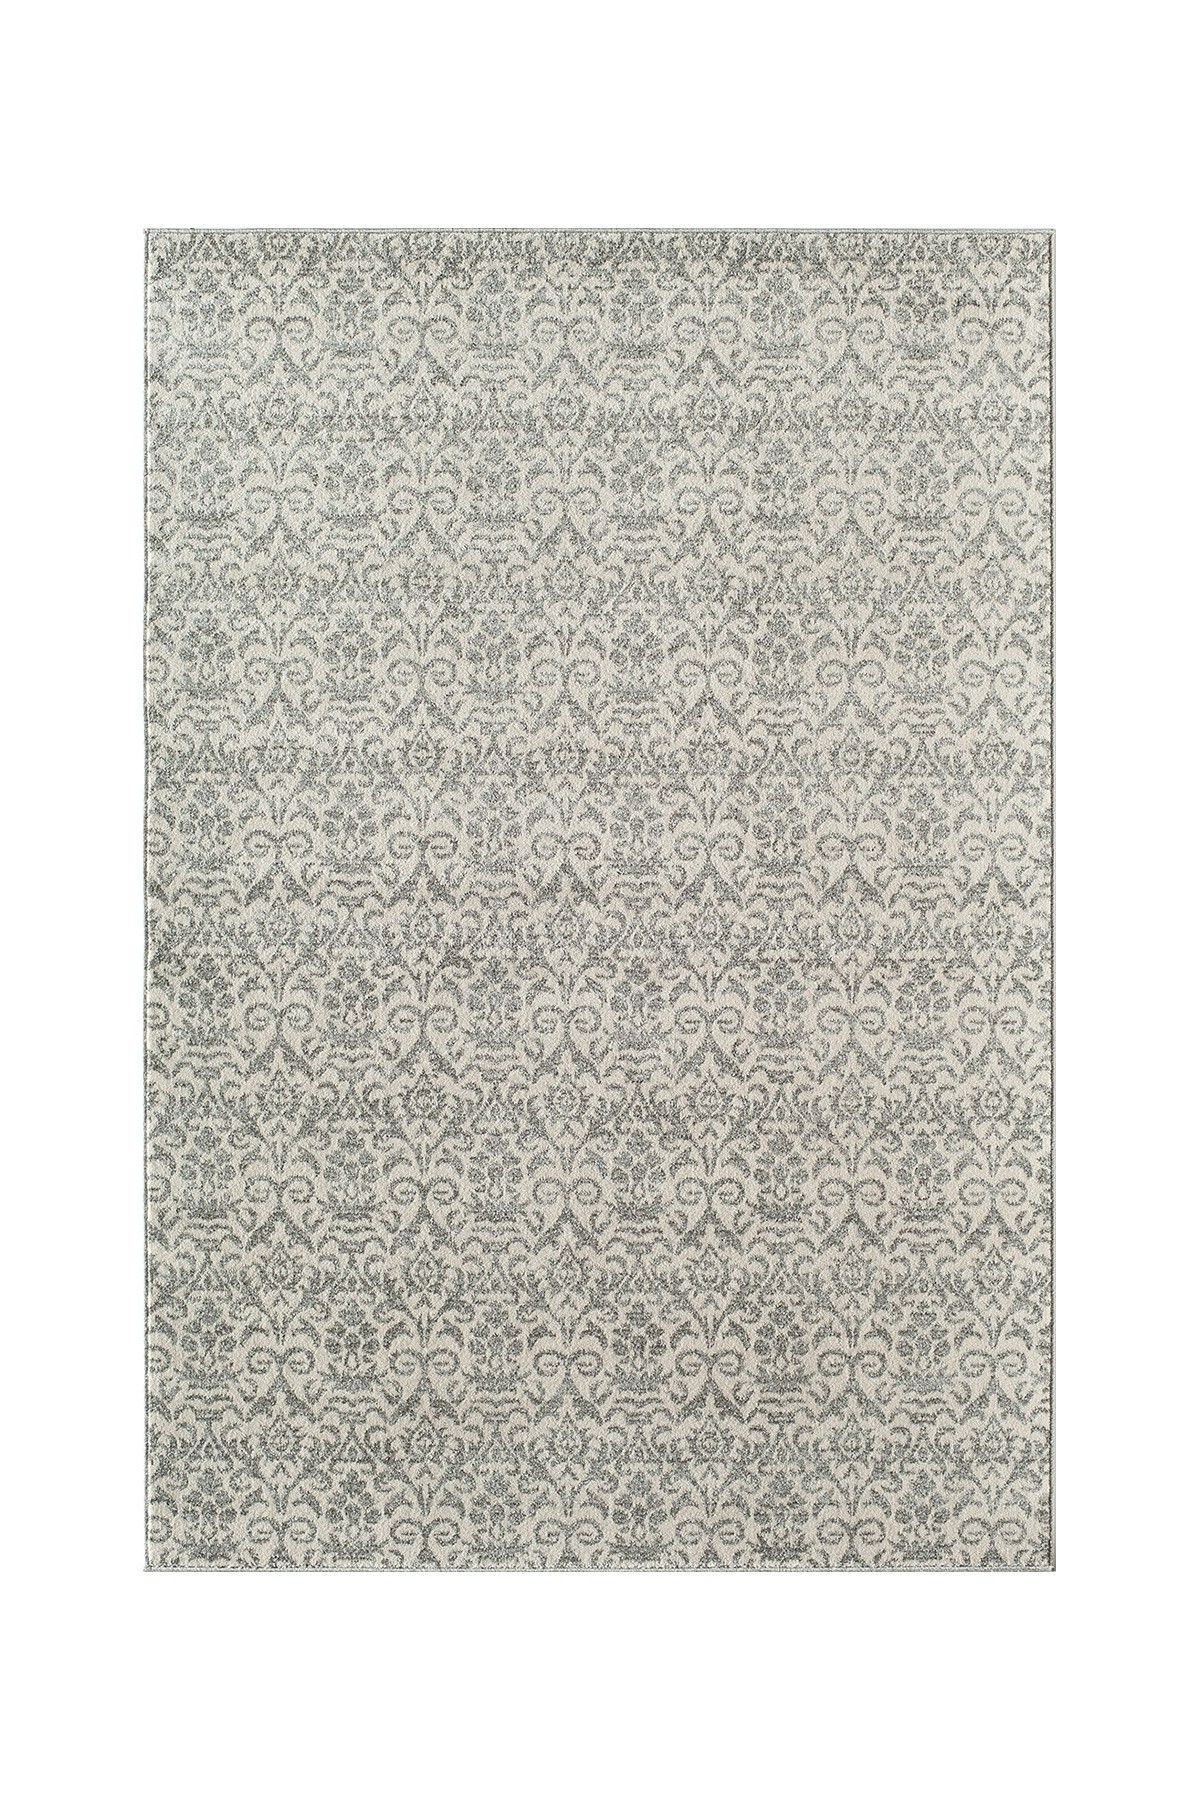 Aspen Rug - White Wash by Rugs America on @HauteLook | Bedroom 2 ...